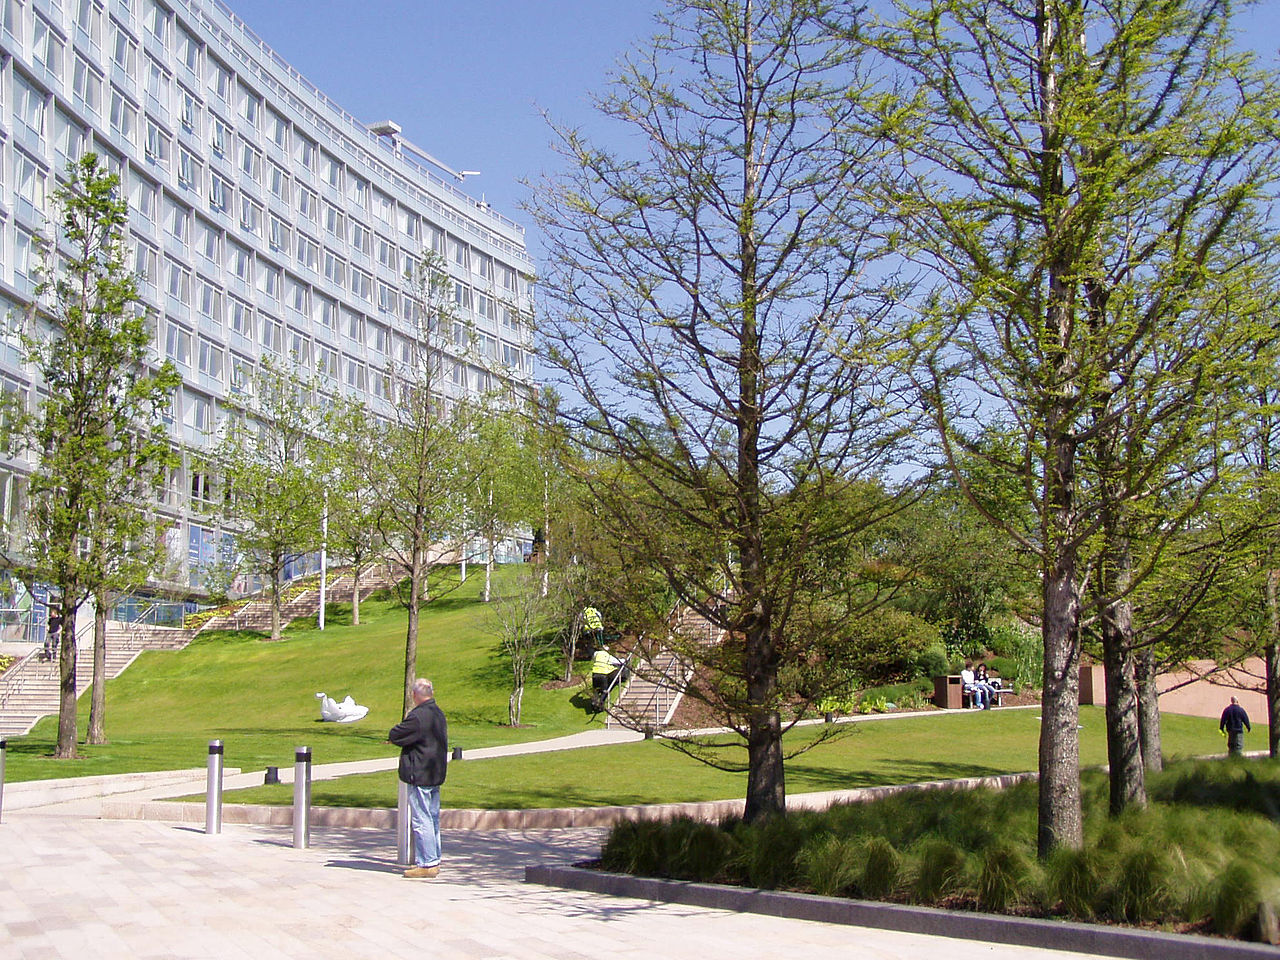 Image result for chavasse park liverpool